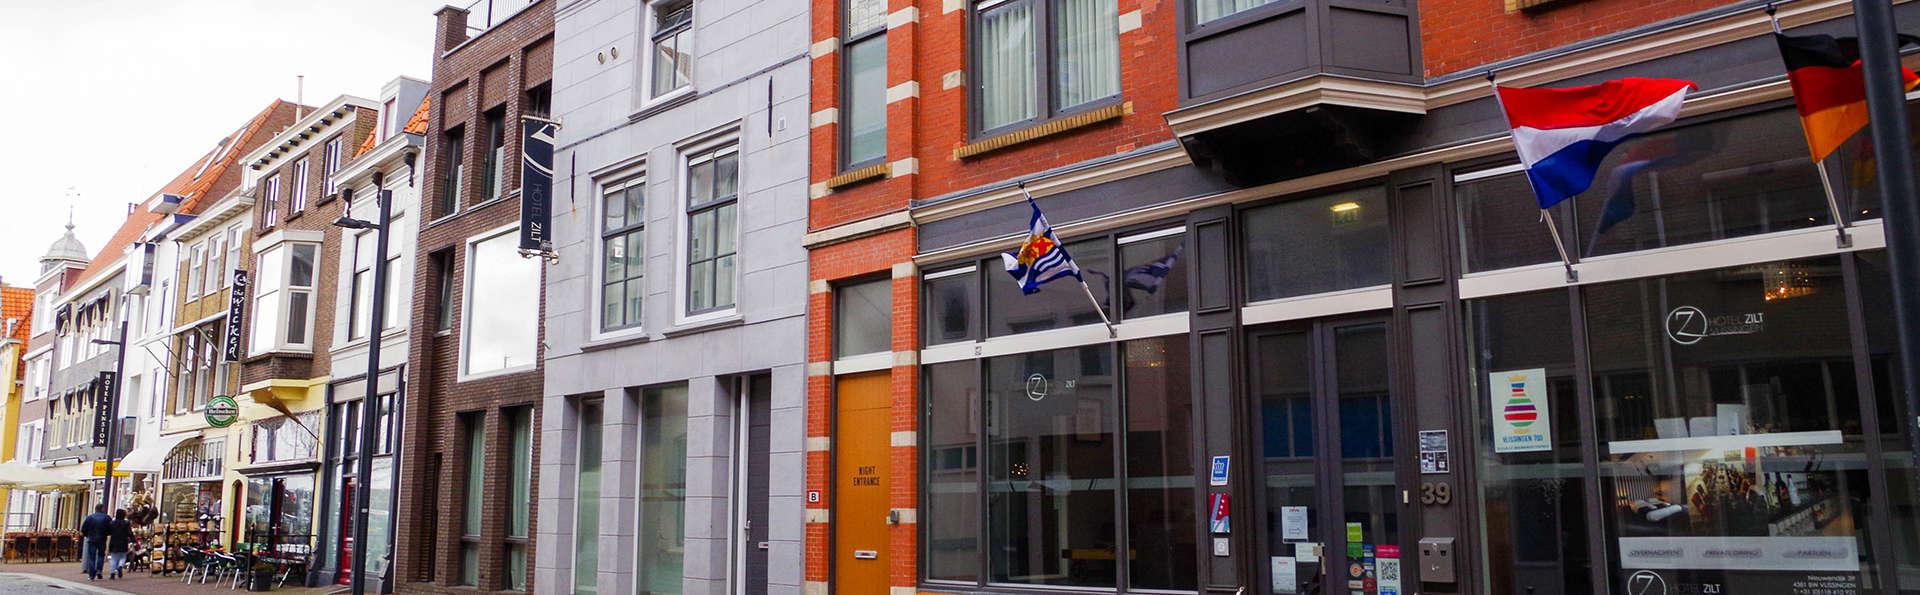 Hotel Zilt - EDIT_FACADE.jpg